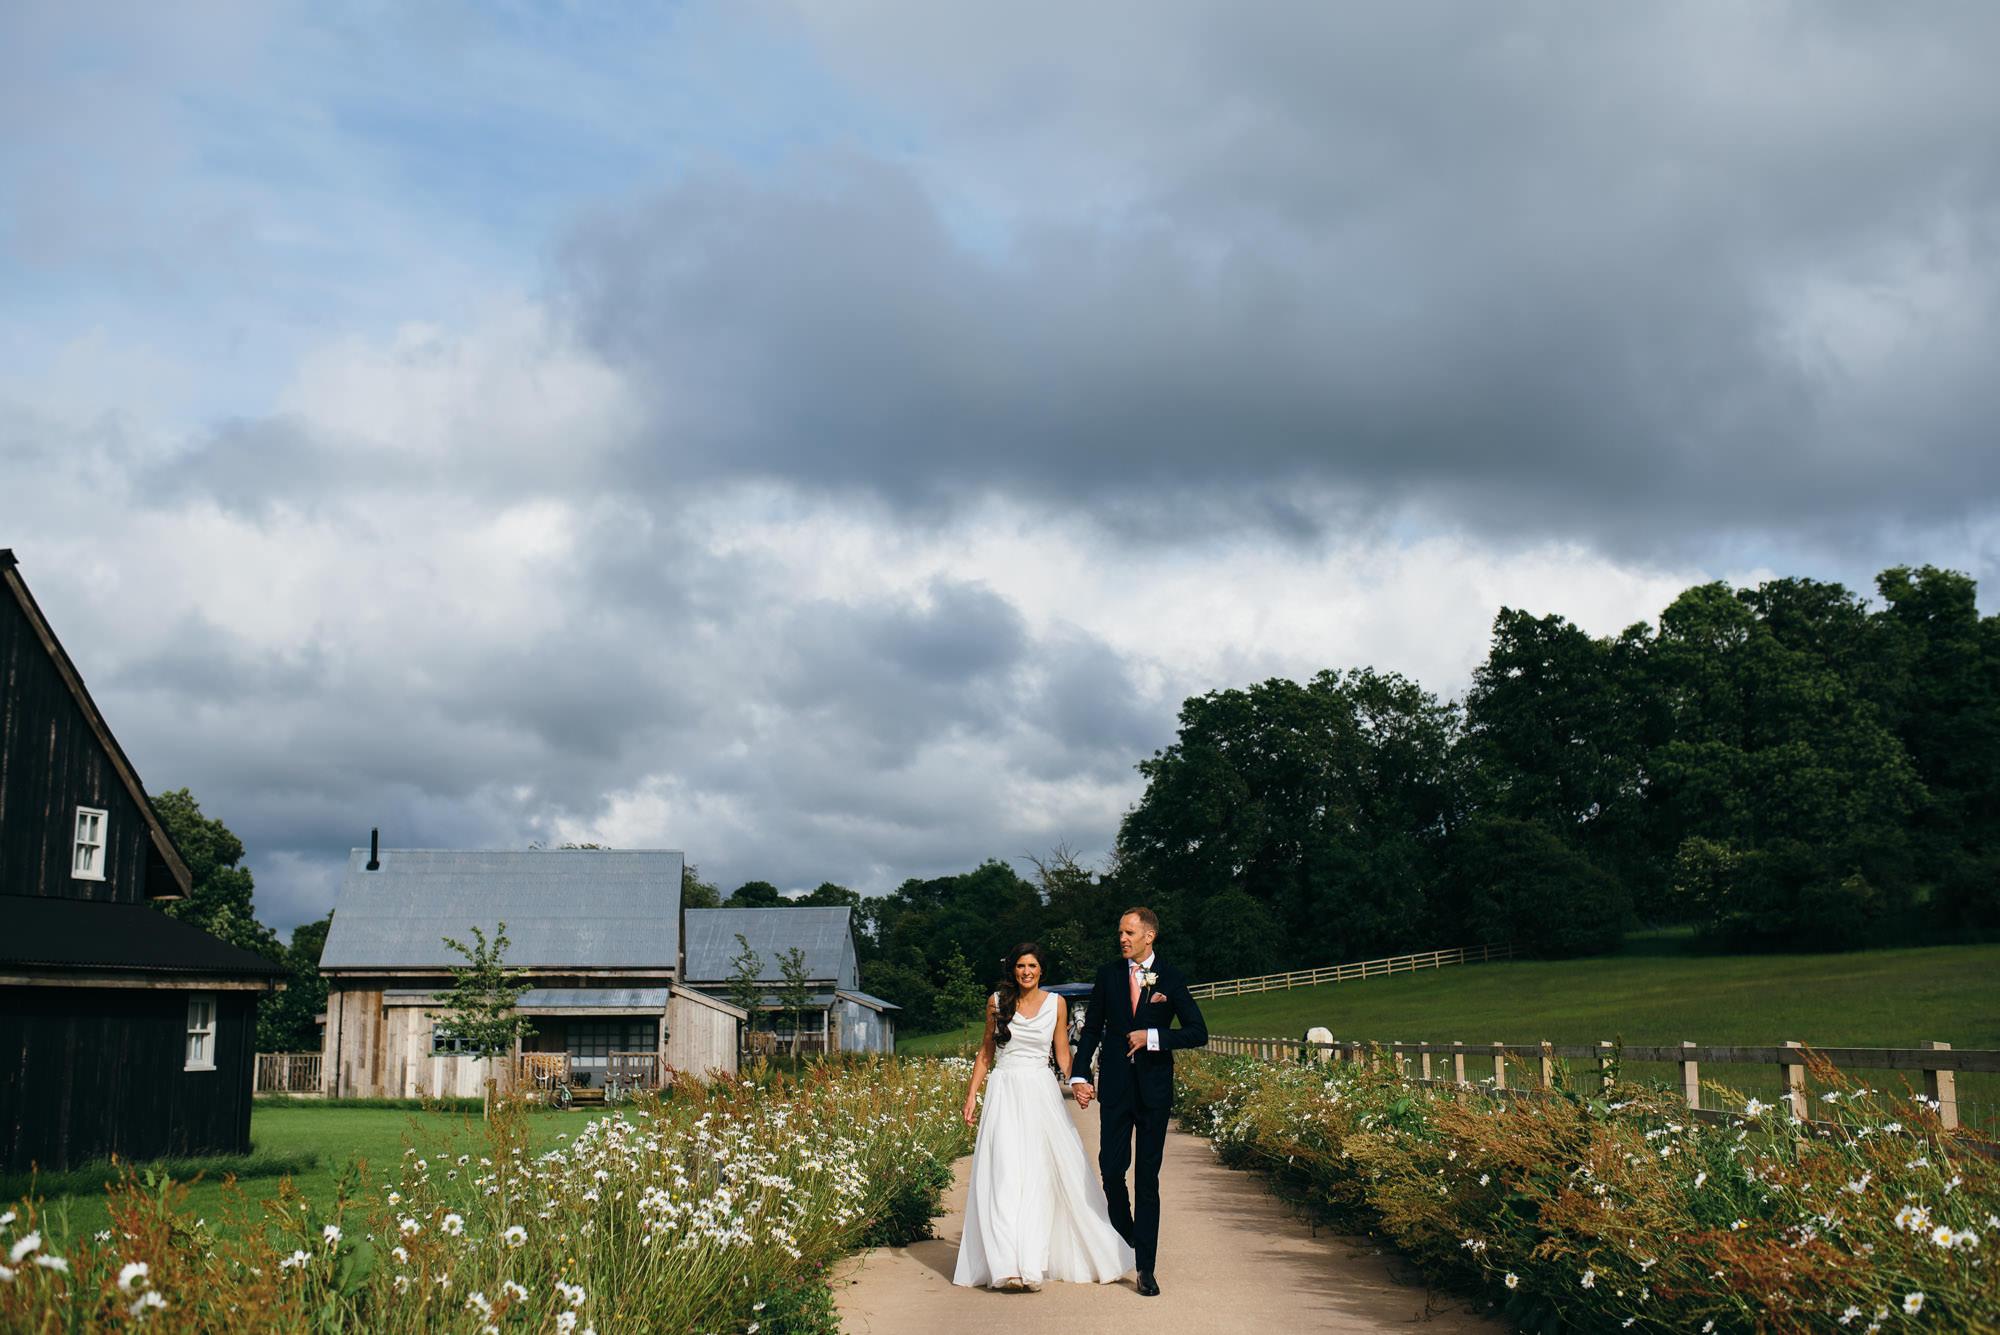 Soho farmhouse unposed wedding photography